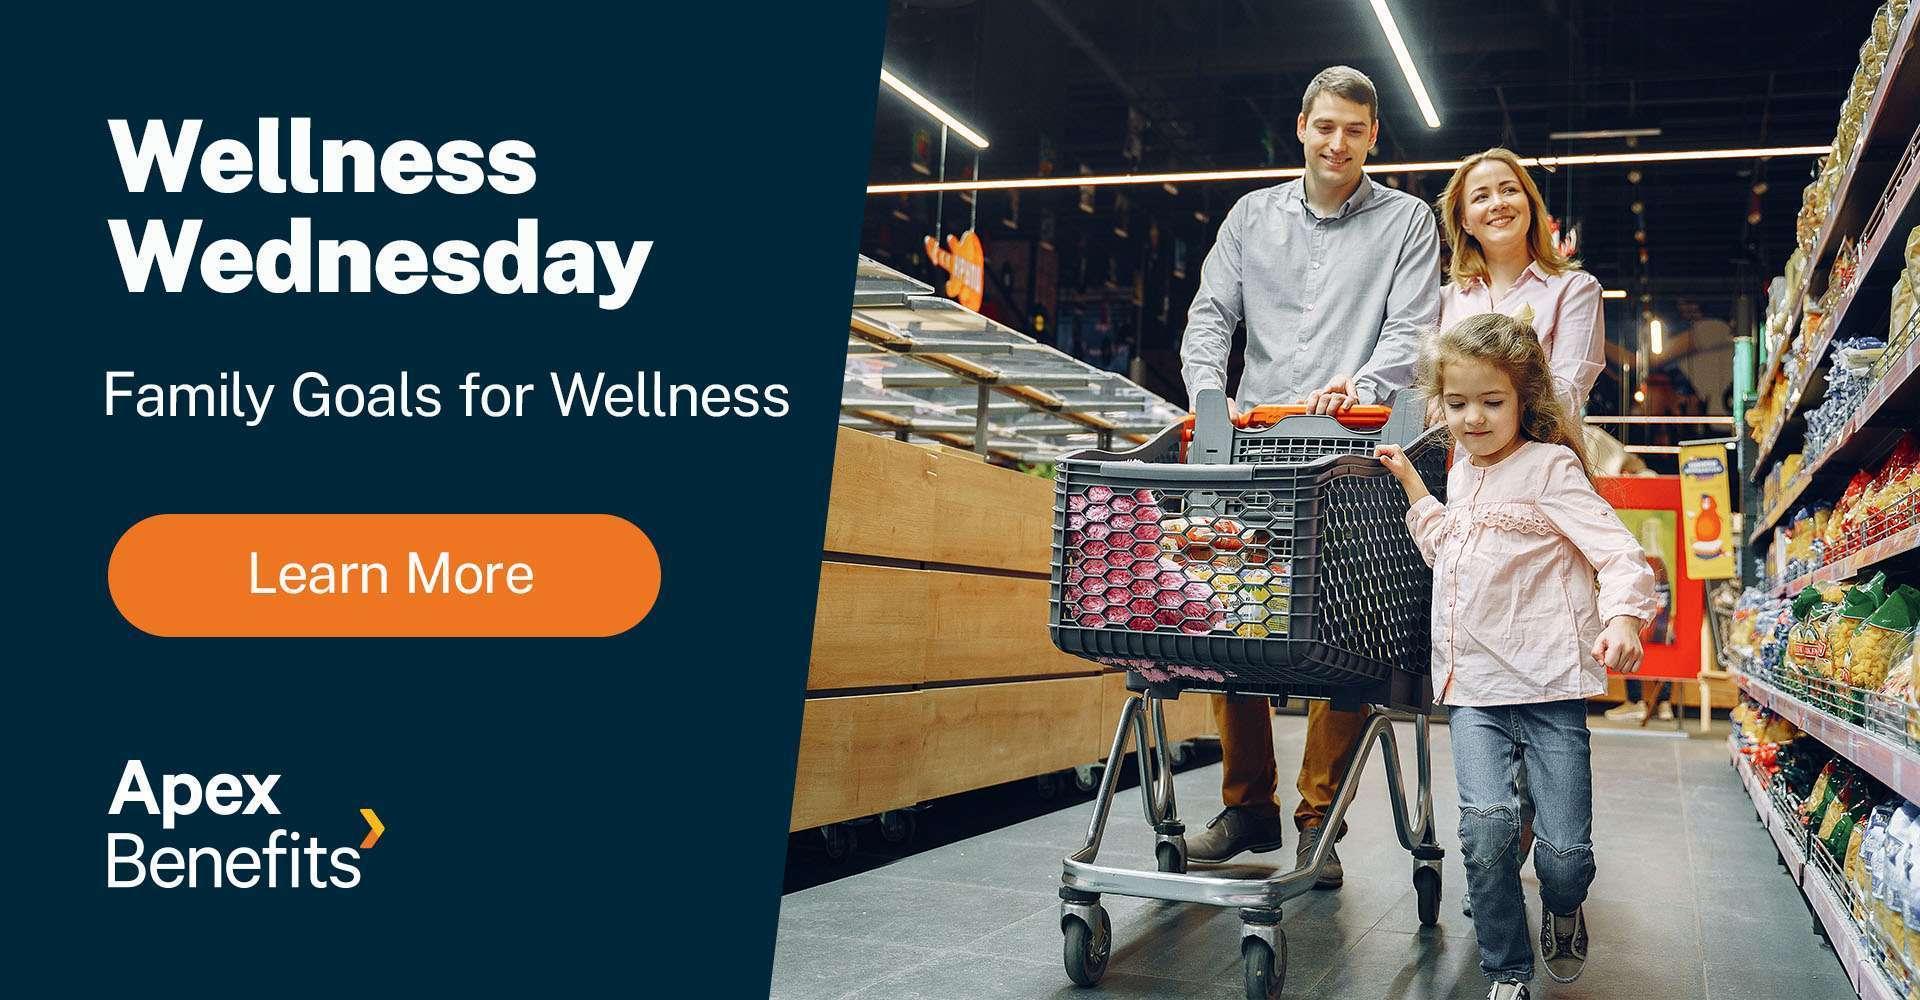 Wellness Wednesday: Family Goals for Wellness